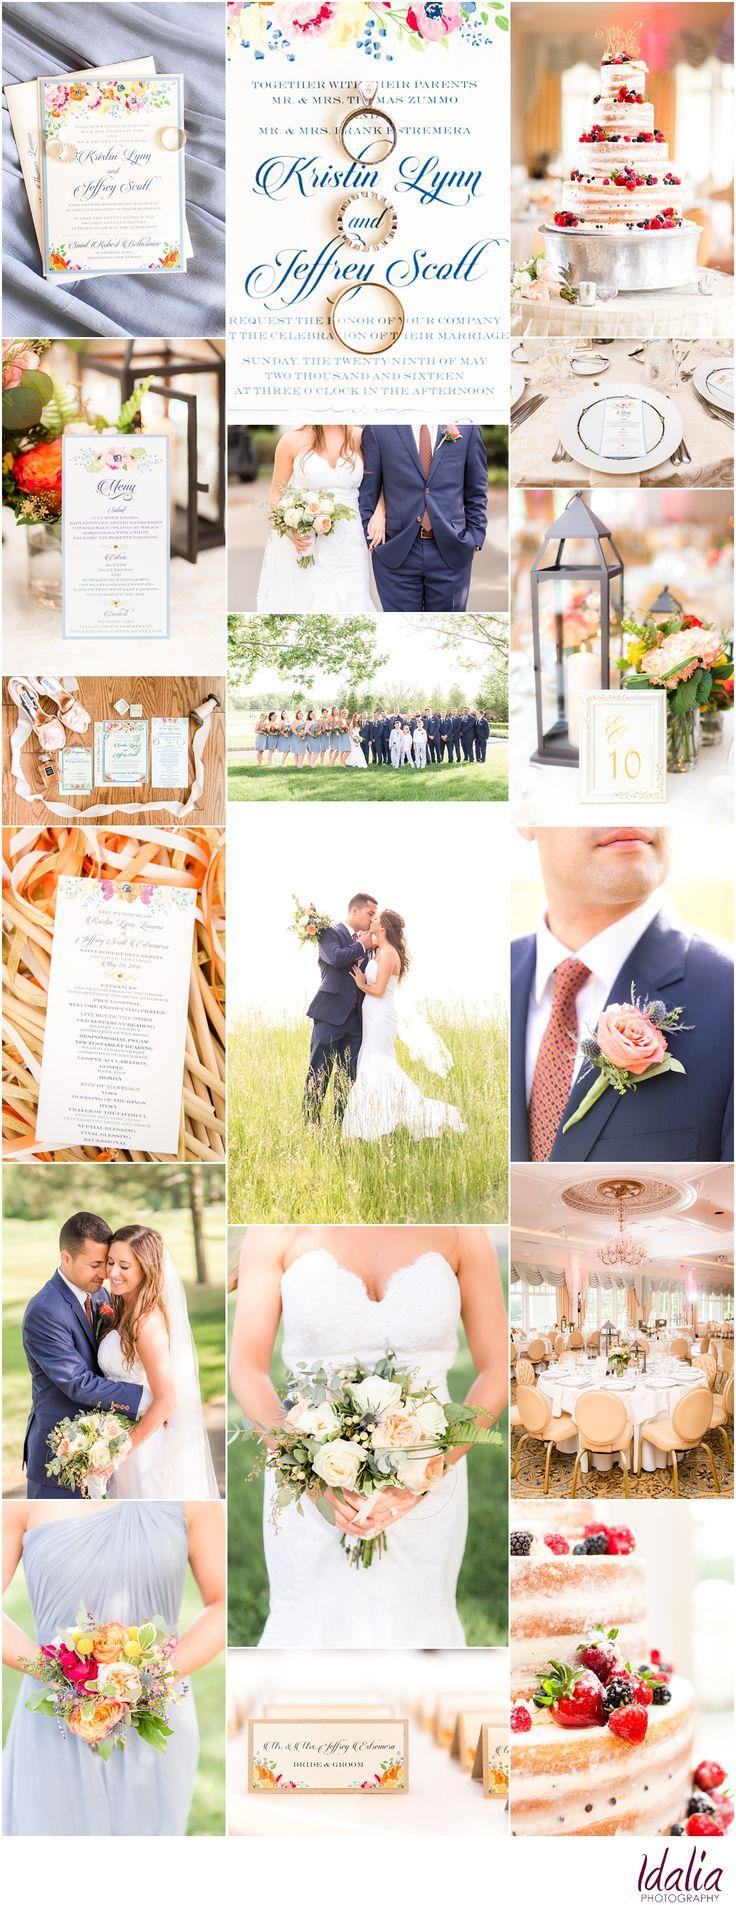 Eagle Oaks Country Club Wedding Photos in Farmingdale, NJ | Photos by NJ Wedding Photographers Idalia Photography